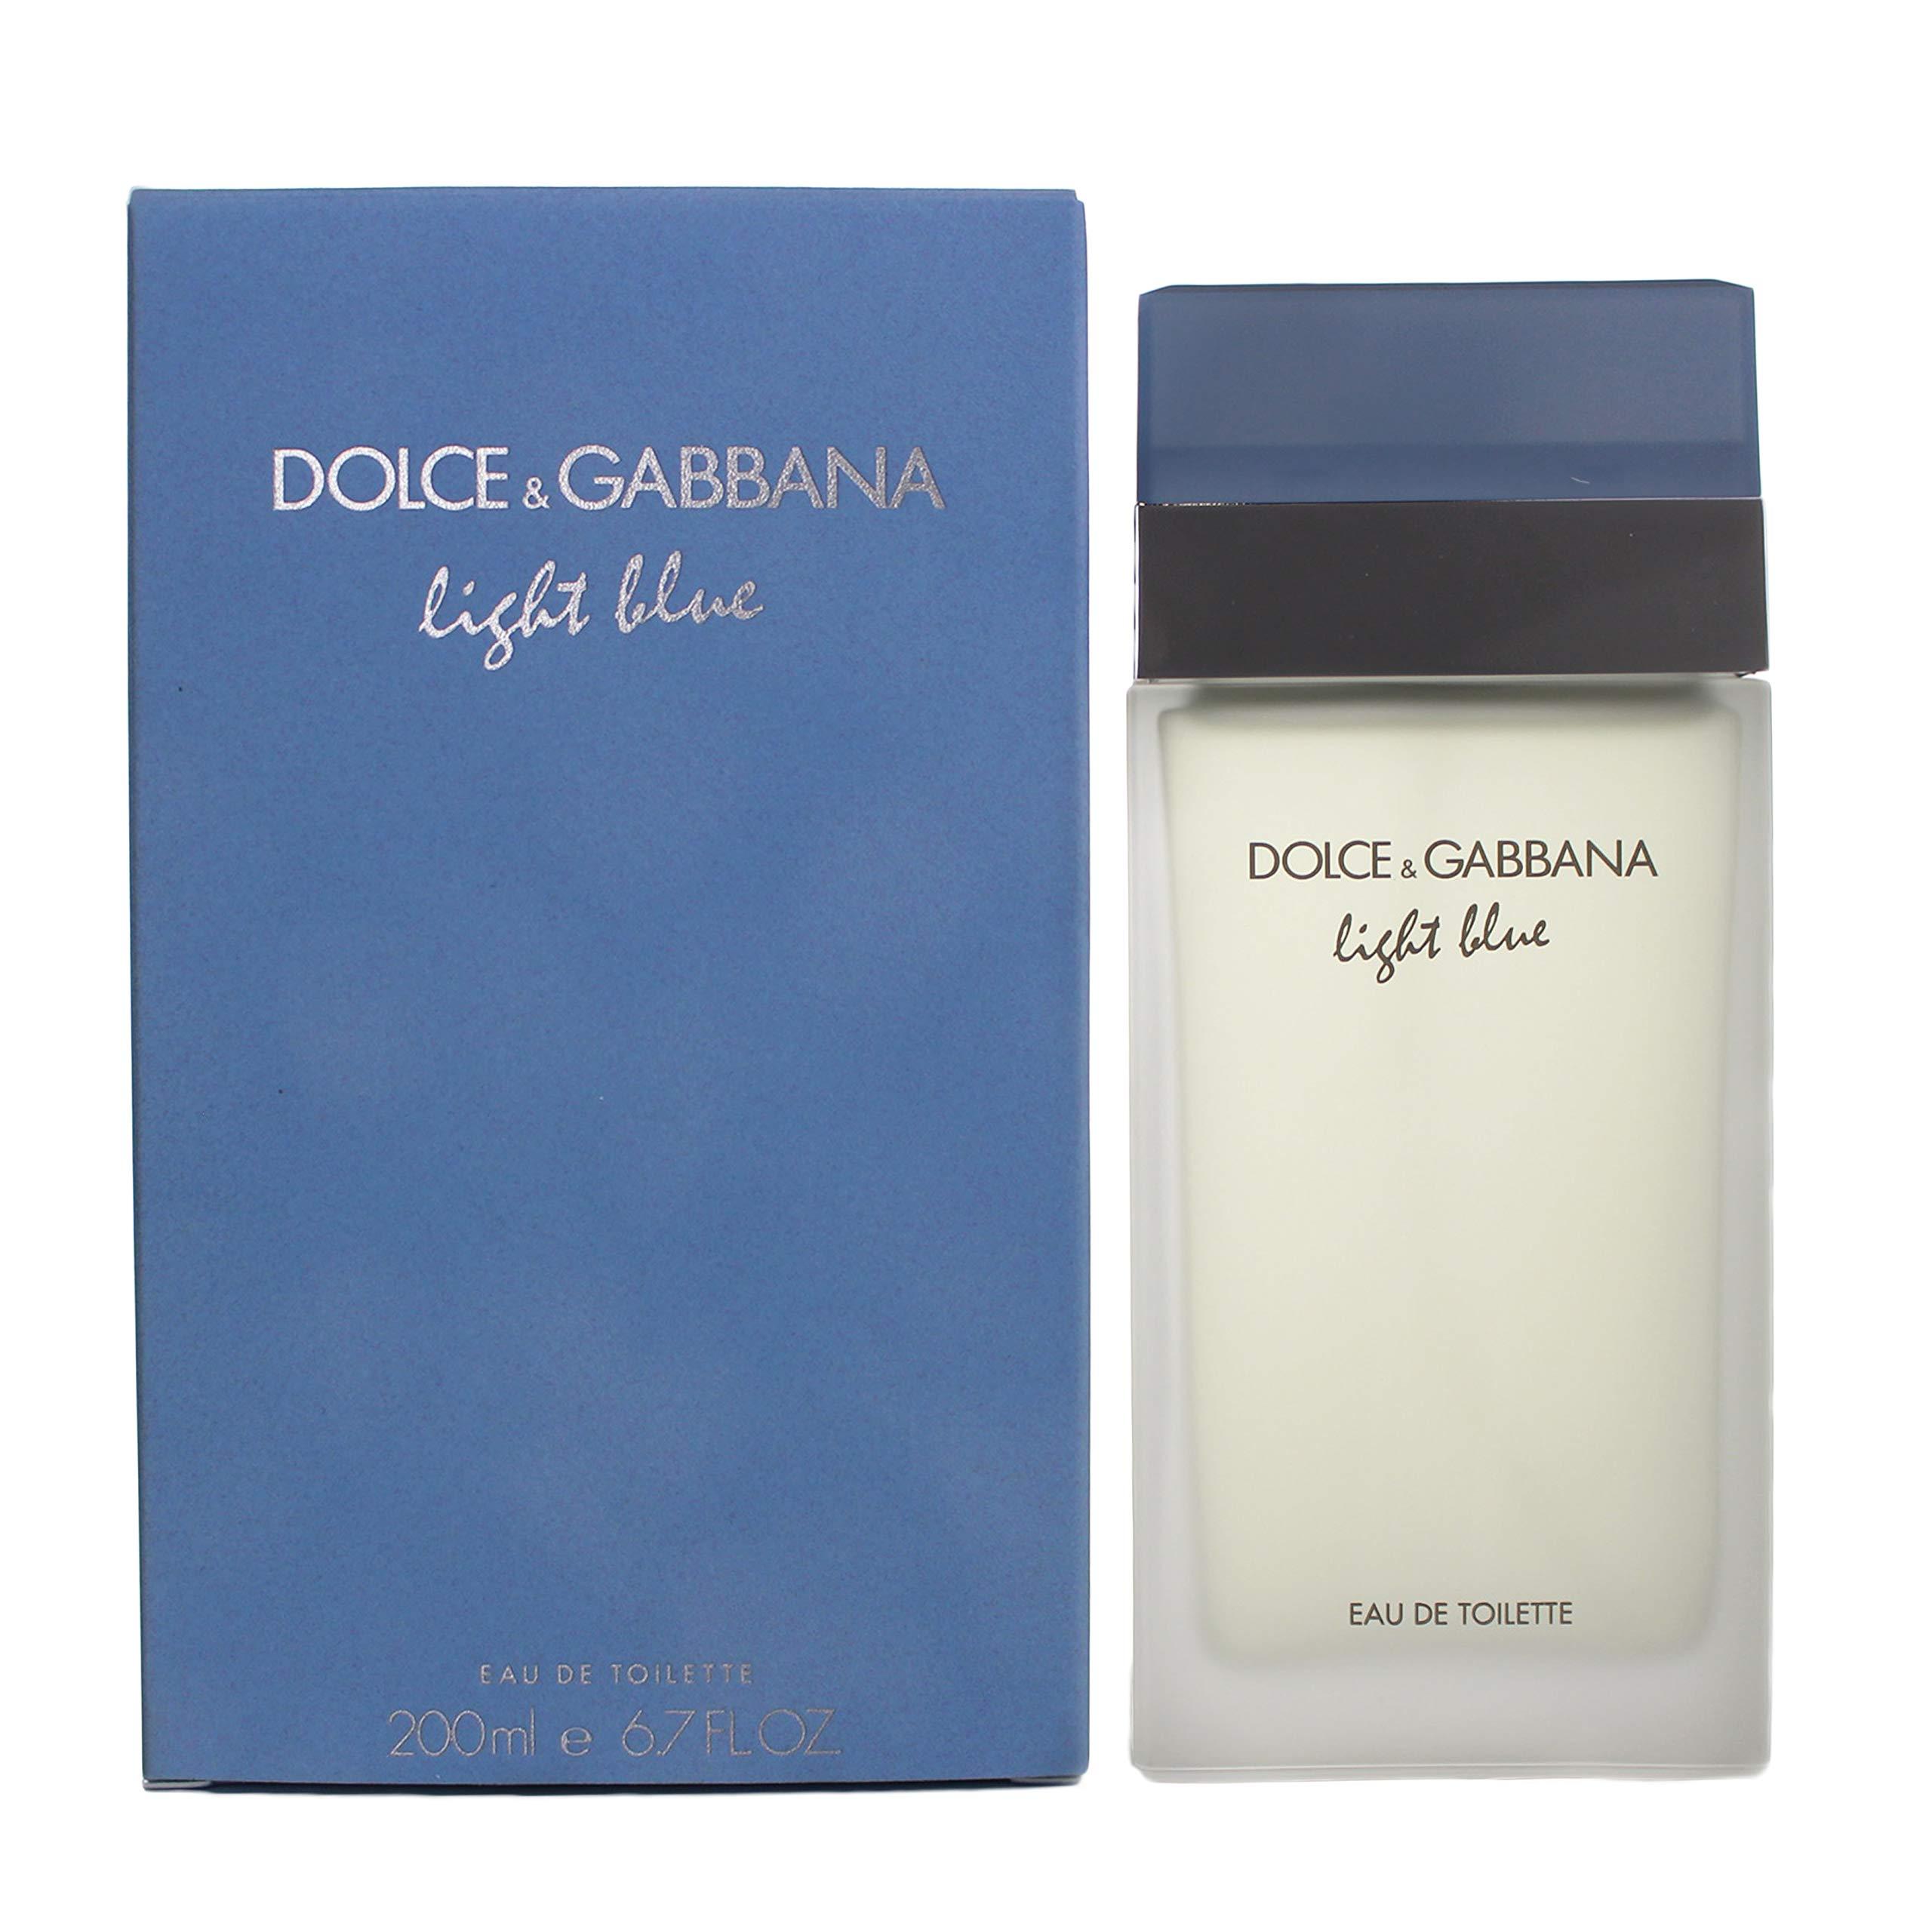 Dolce & Gabbana Women's Eau De Toilette Spray, Light Blue, 6.7 Fl. Oz (Pack of 1)